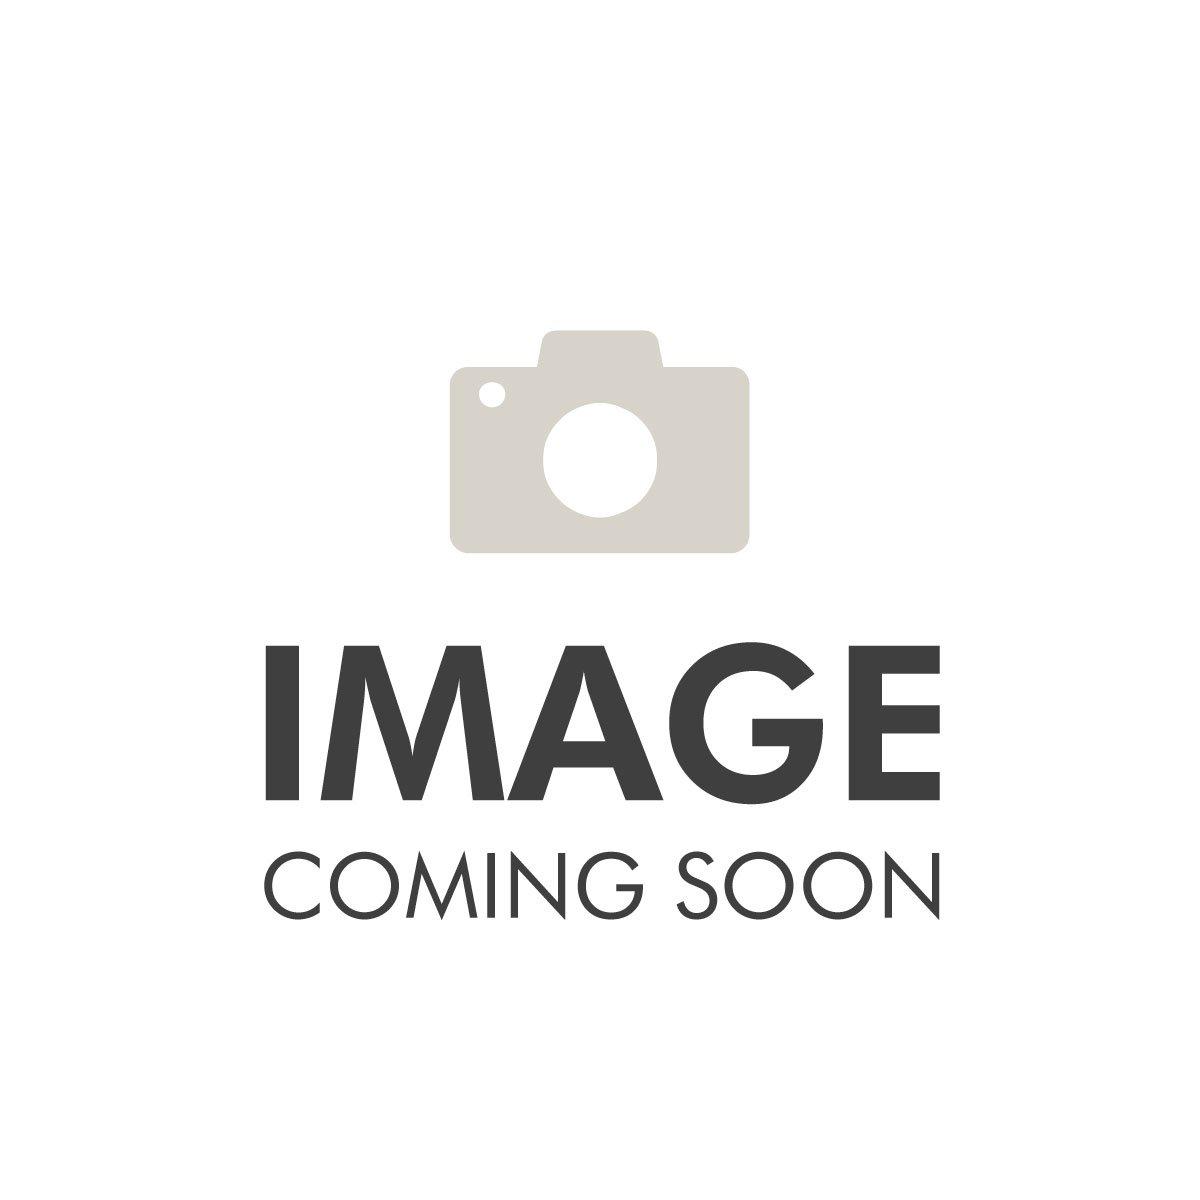 L'Oreal Loreal Age Perfect Day Cream 50ml